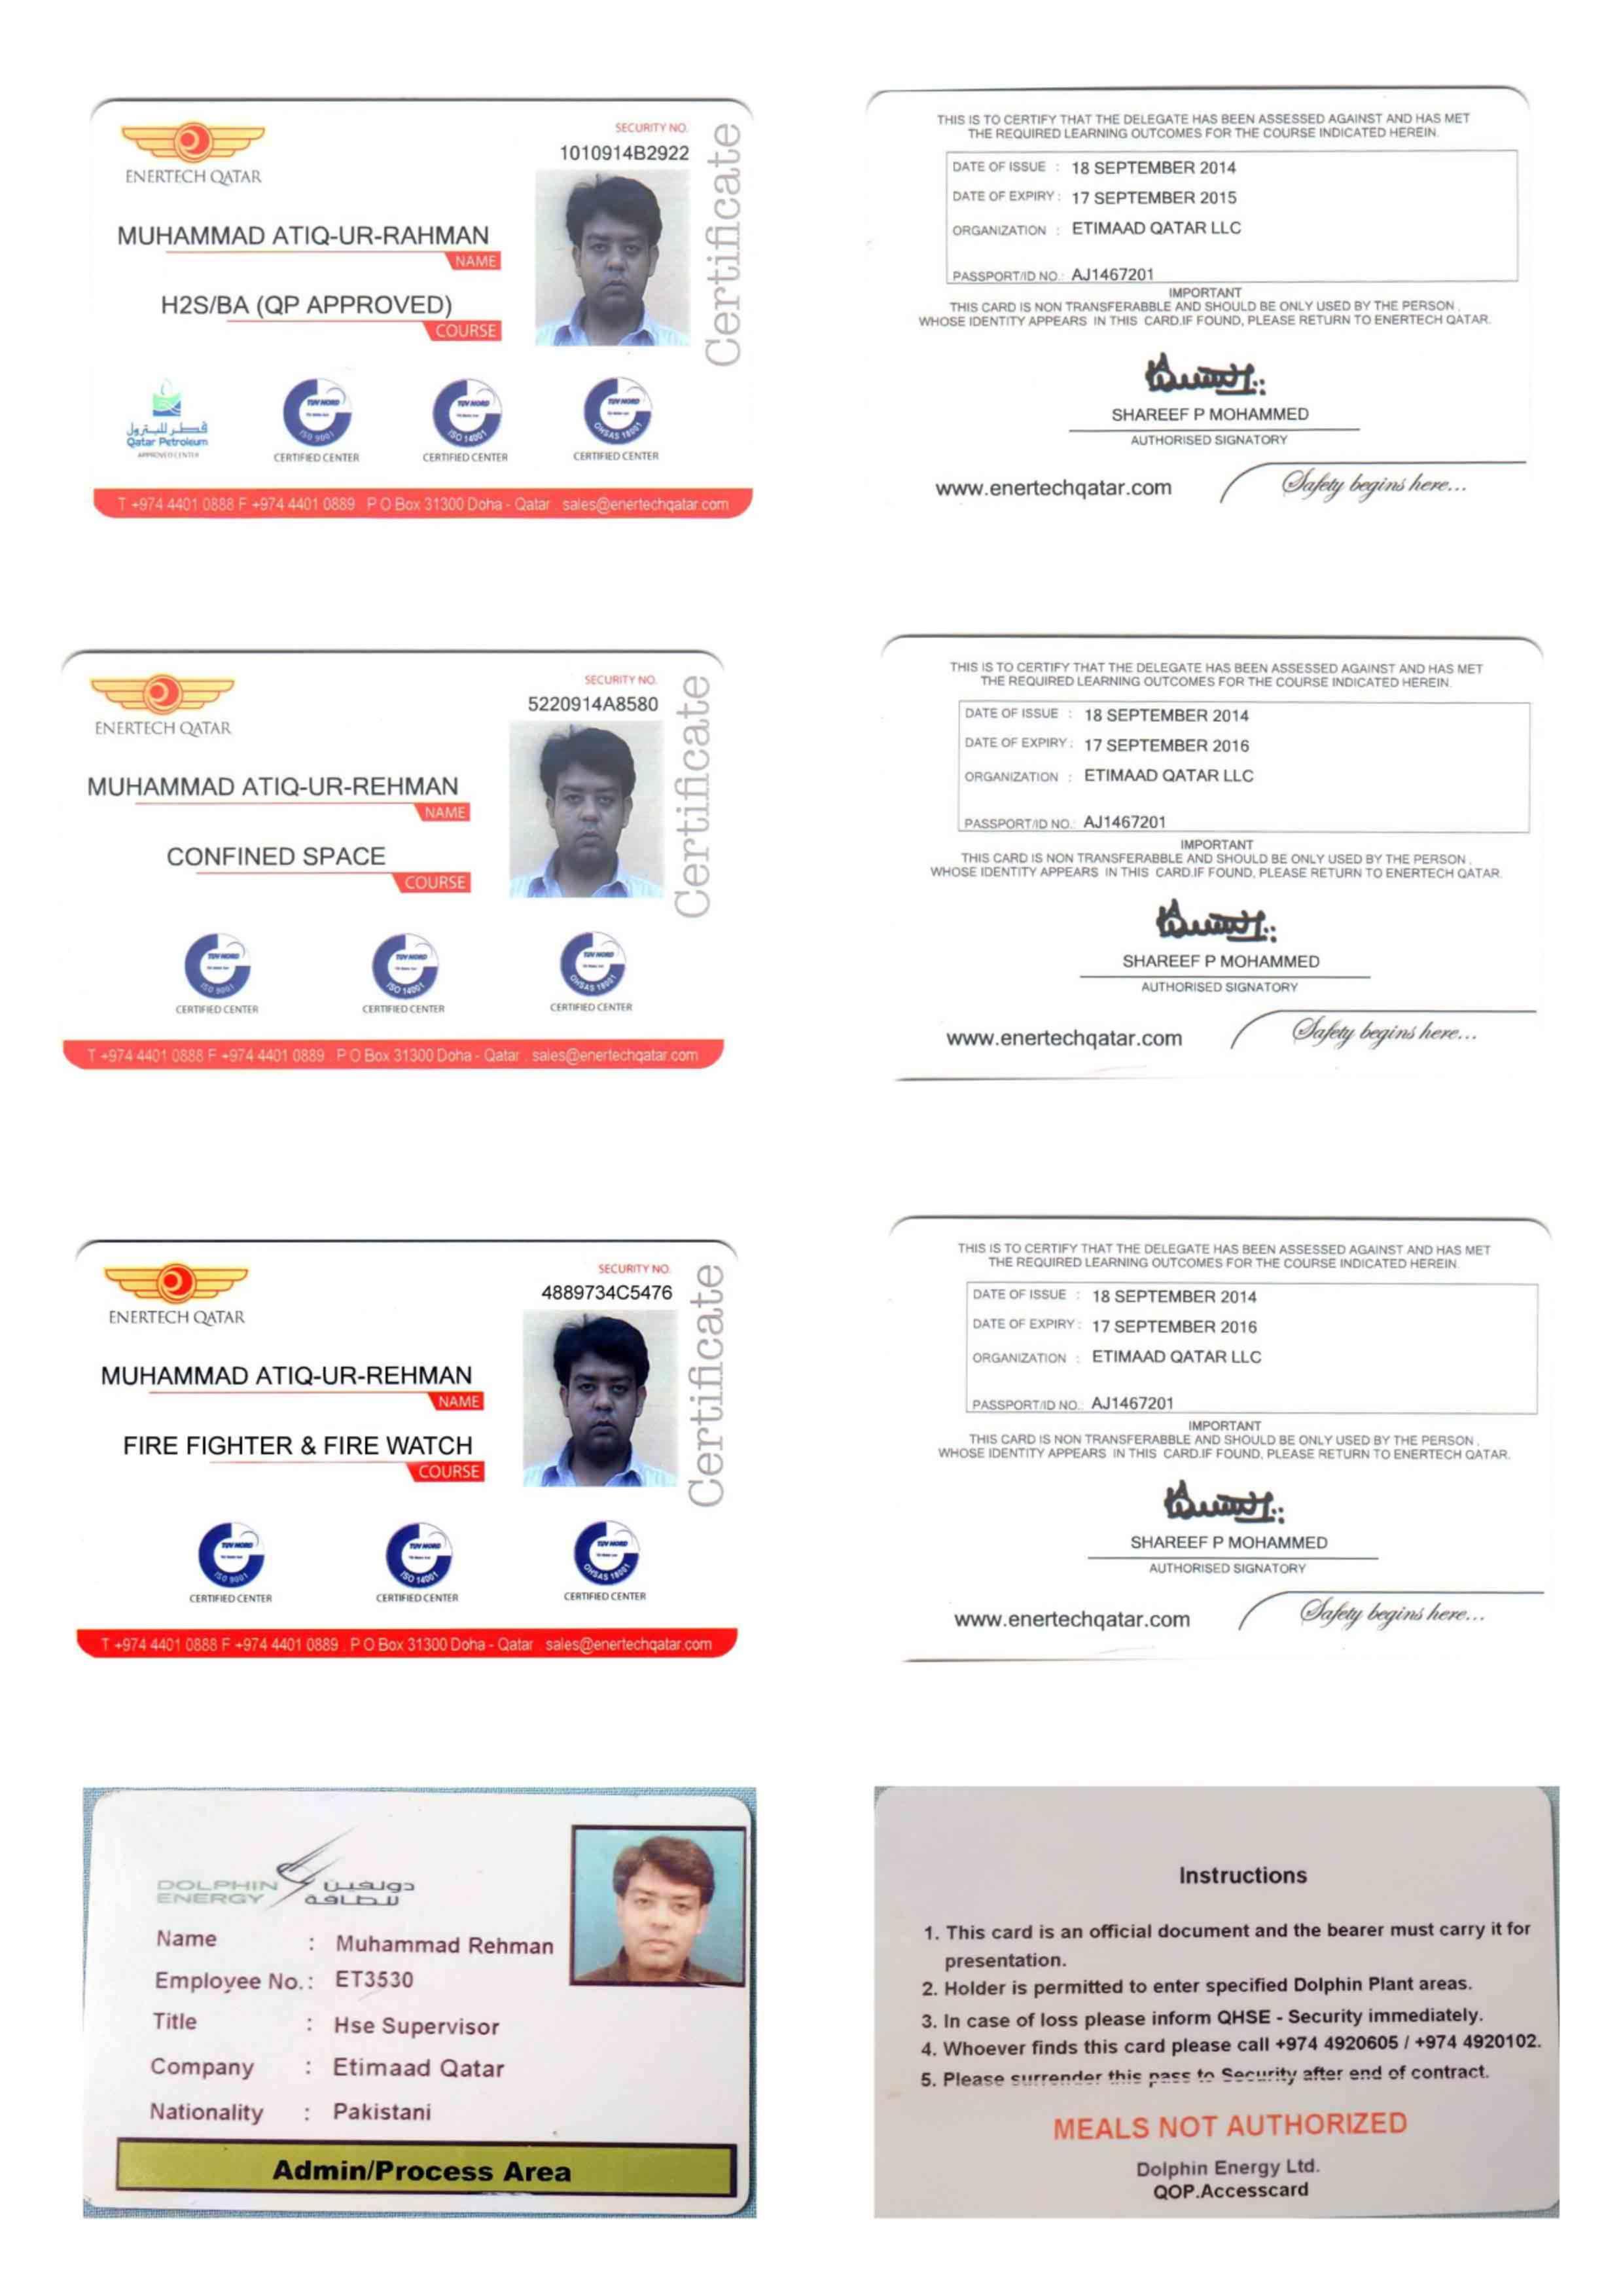 Muhammad atiq ur rehman bayt training institute ener tech doha qatar 3rd party certificate 1betcityfo Images